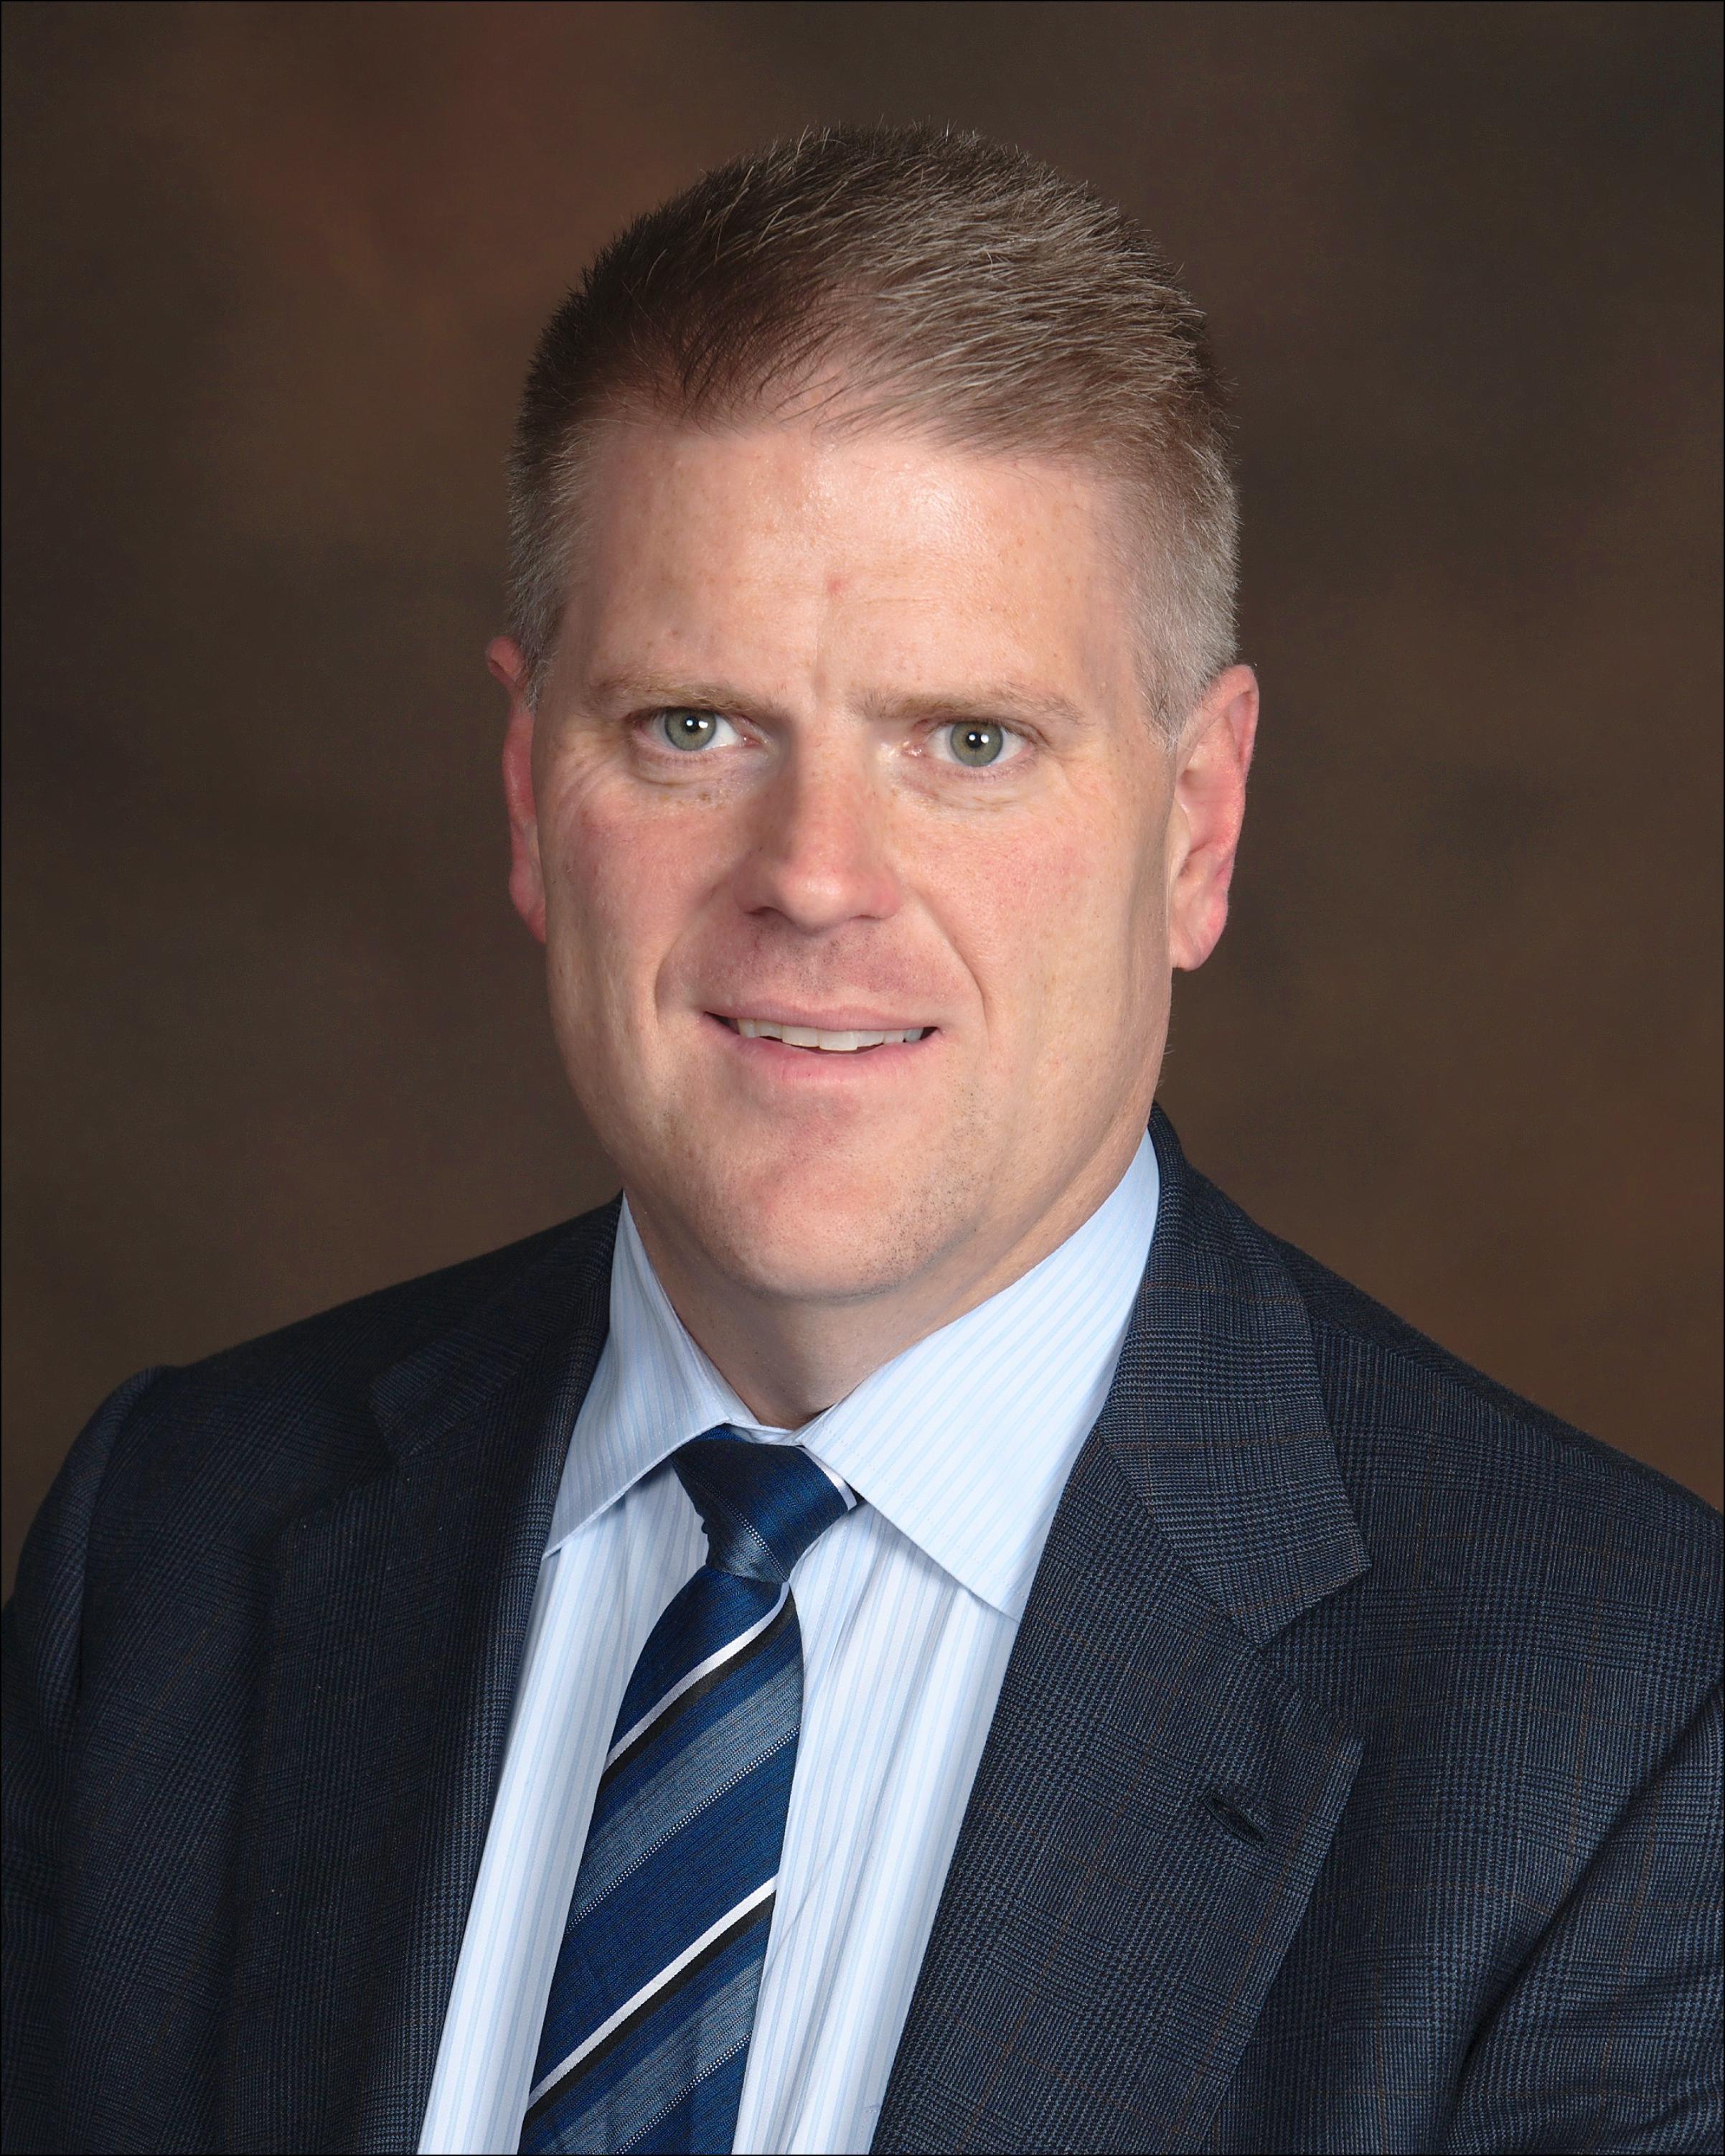 Pastor Martin Hawley